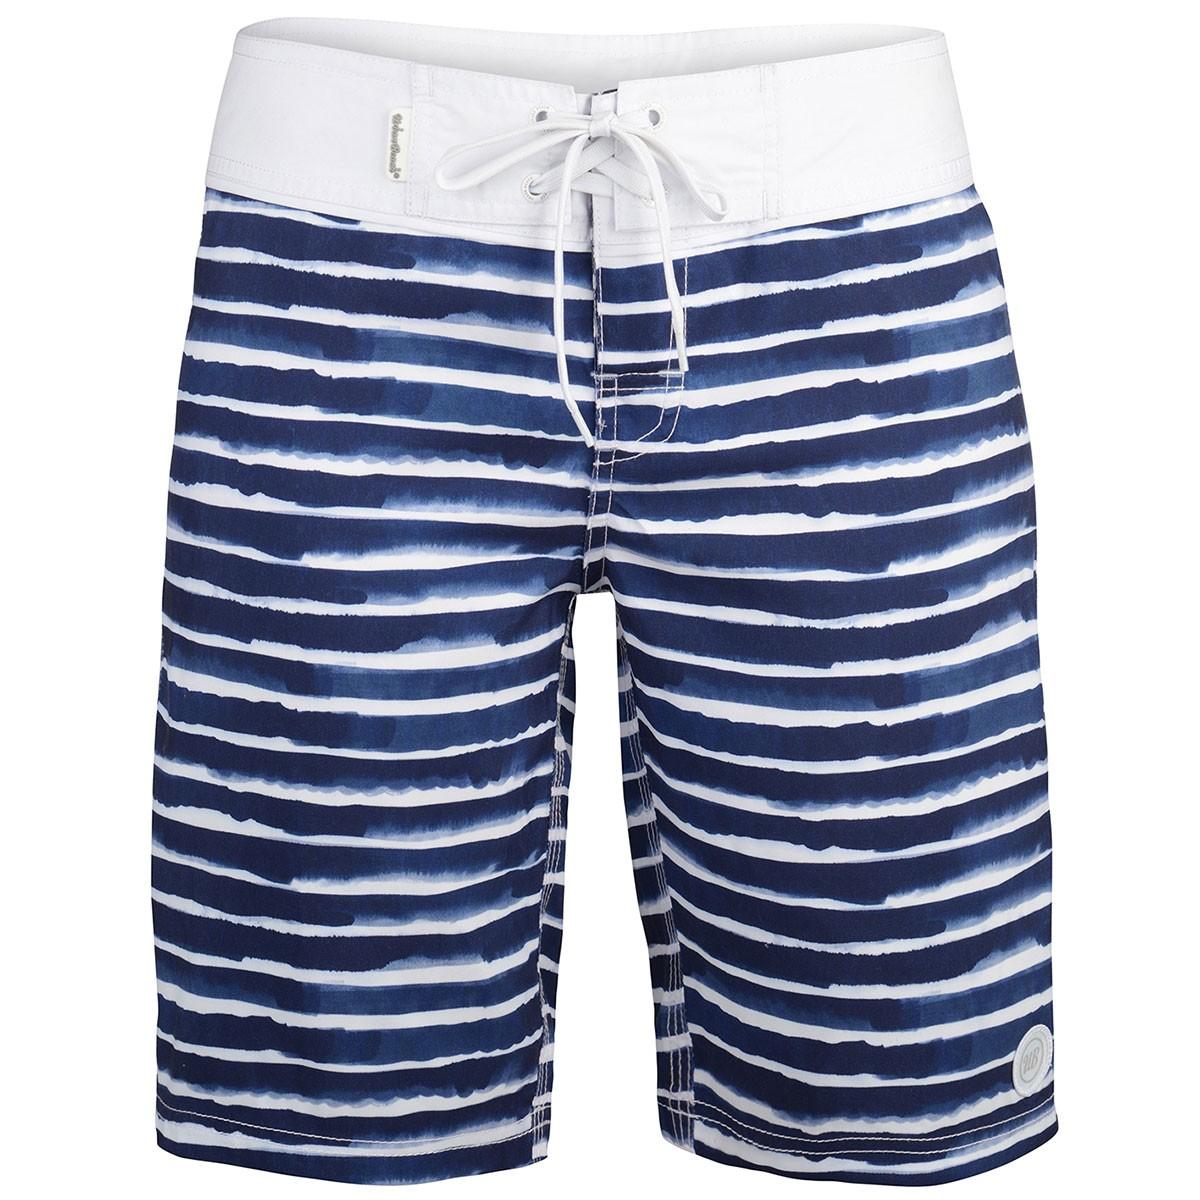 Womens Kapalua Board Shorts - Navy - Boardshorts - Clothing - Womens a9461096c